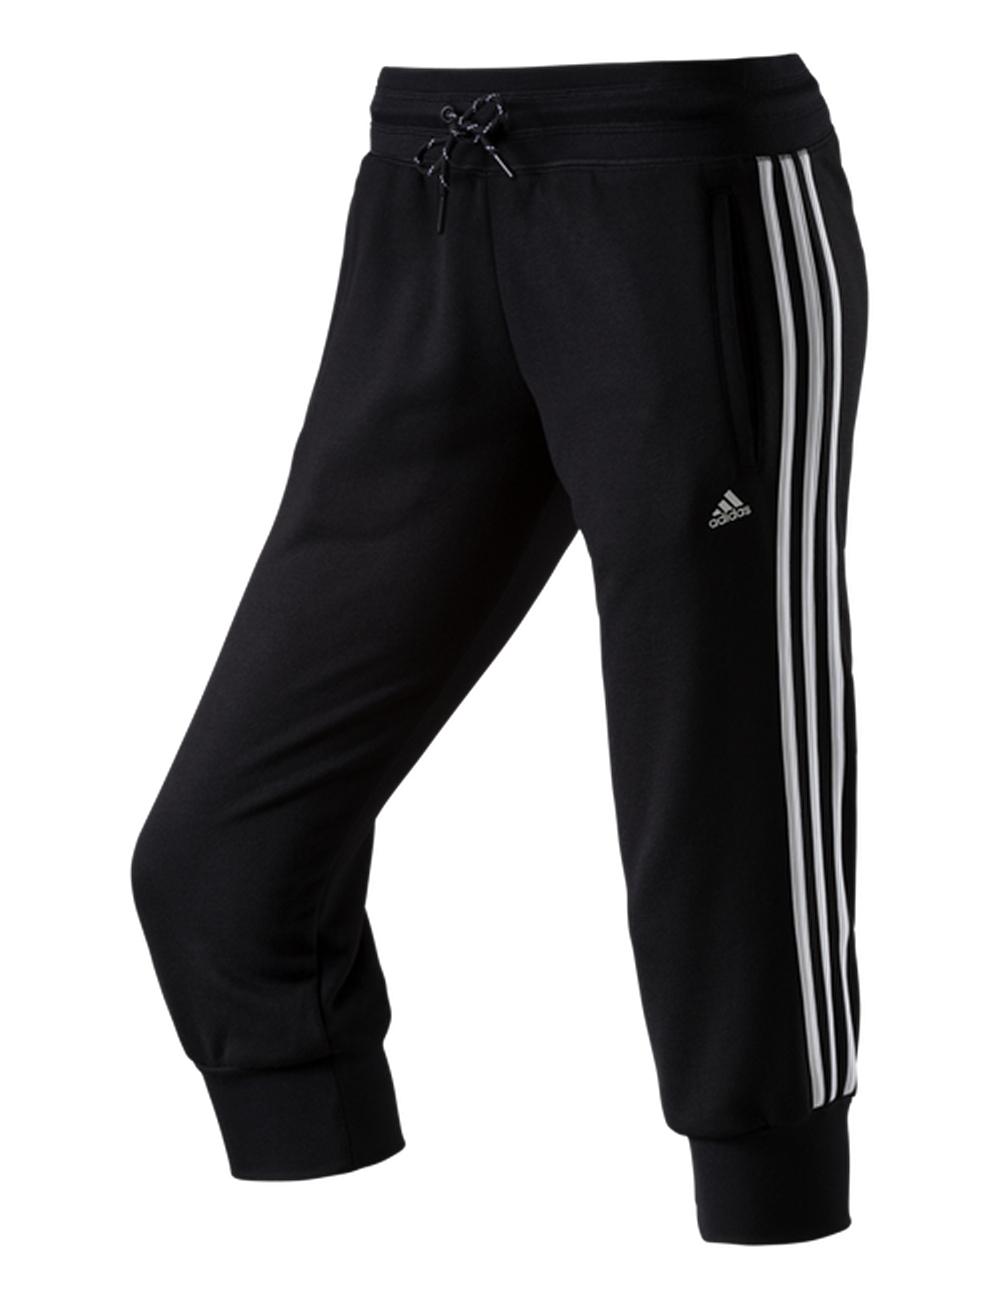 adidas damen 3 4 trainingshose hose capri pants 3s schwarz. Black Bedroom Furniture Sets. Home Design Ideas